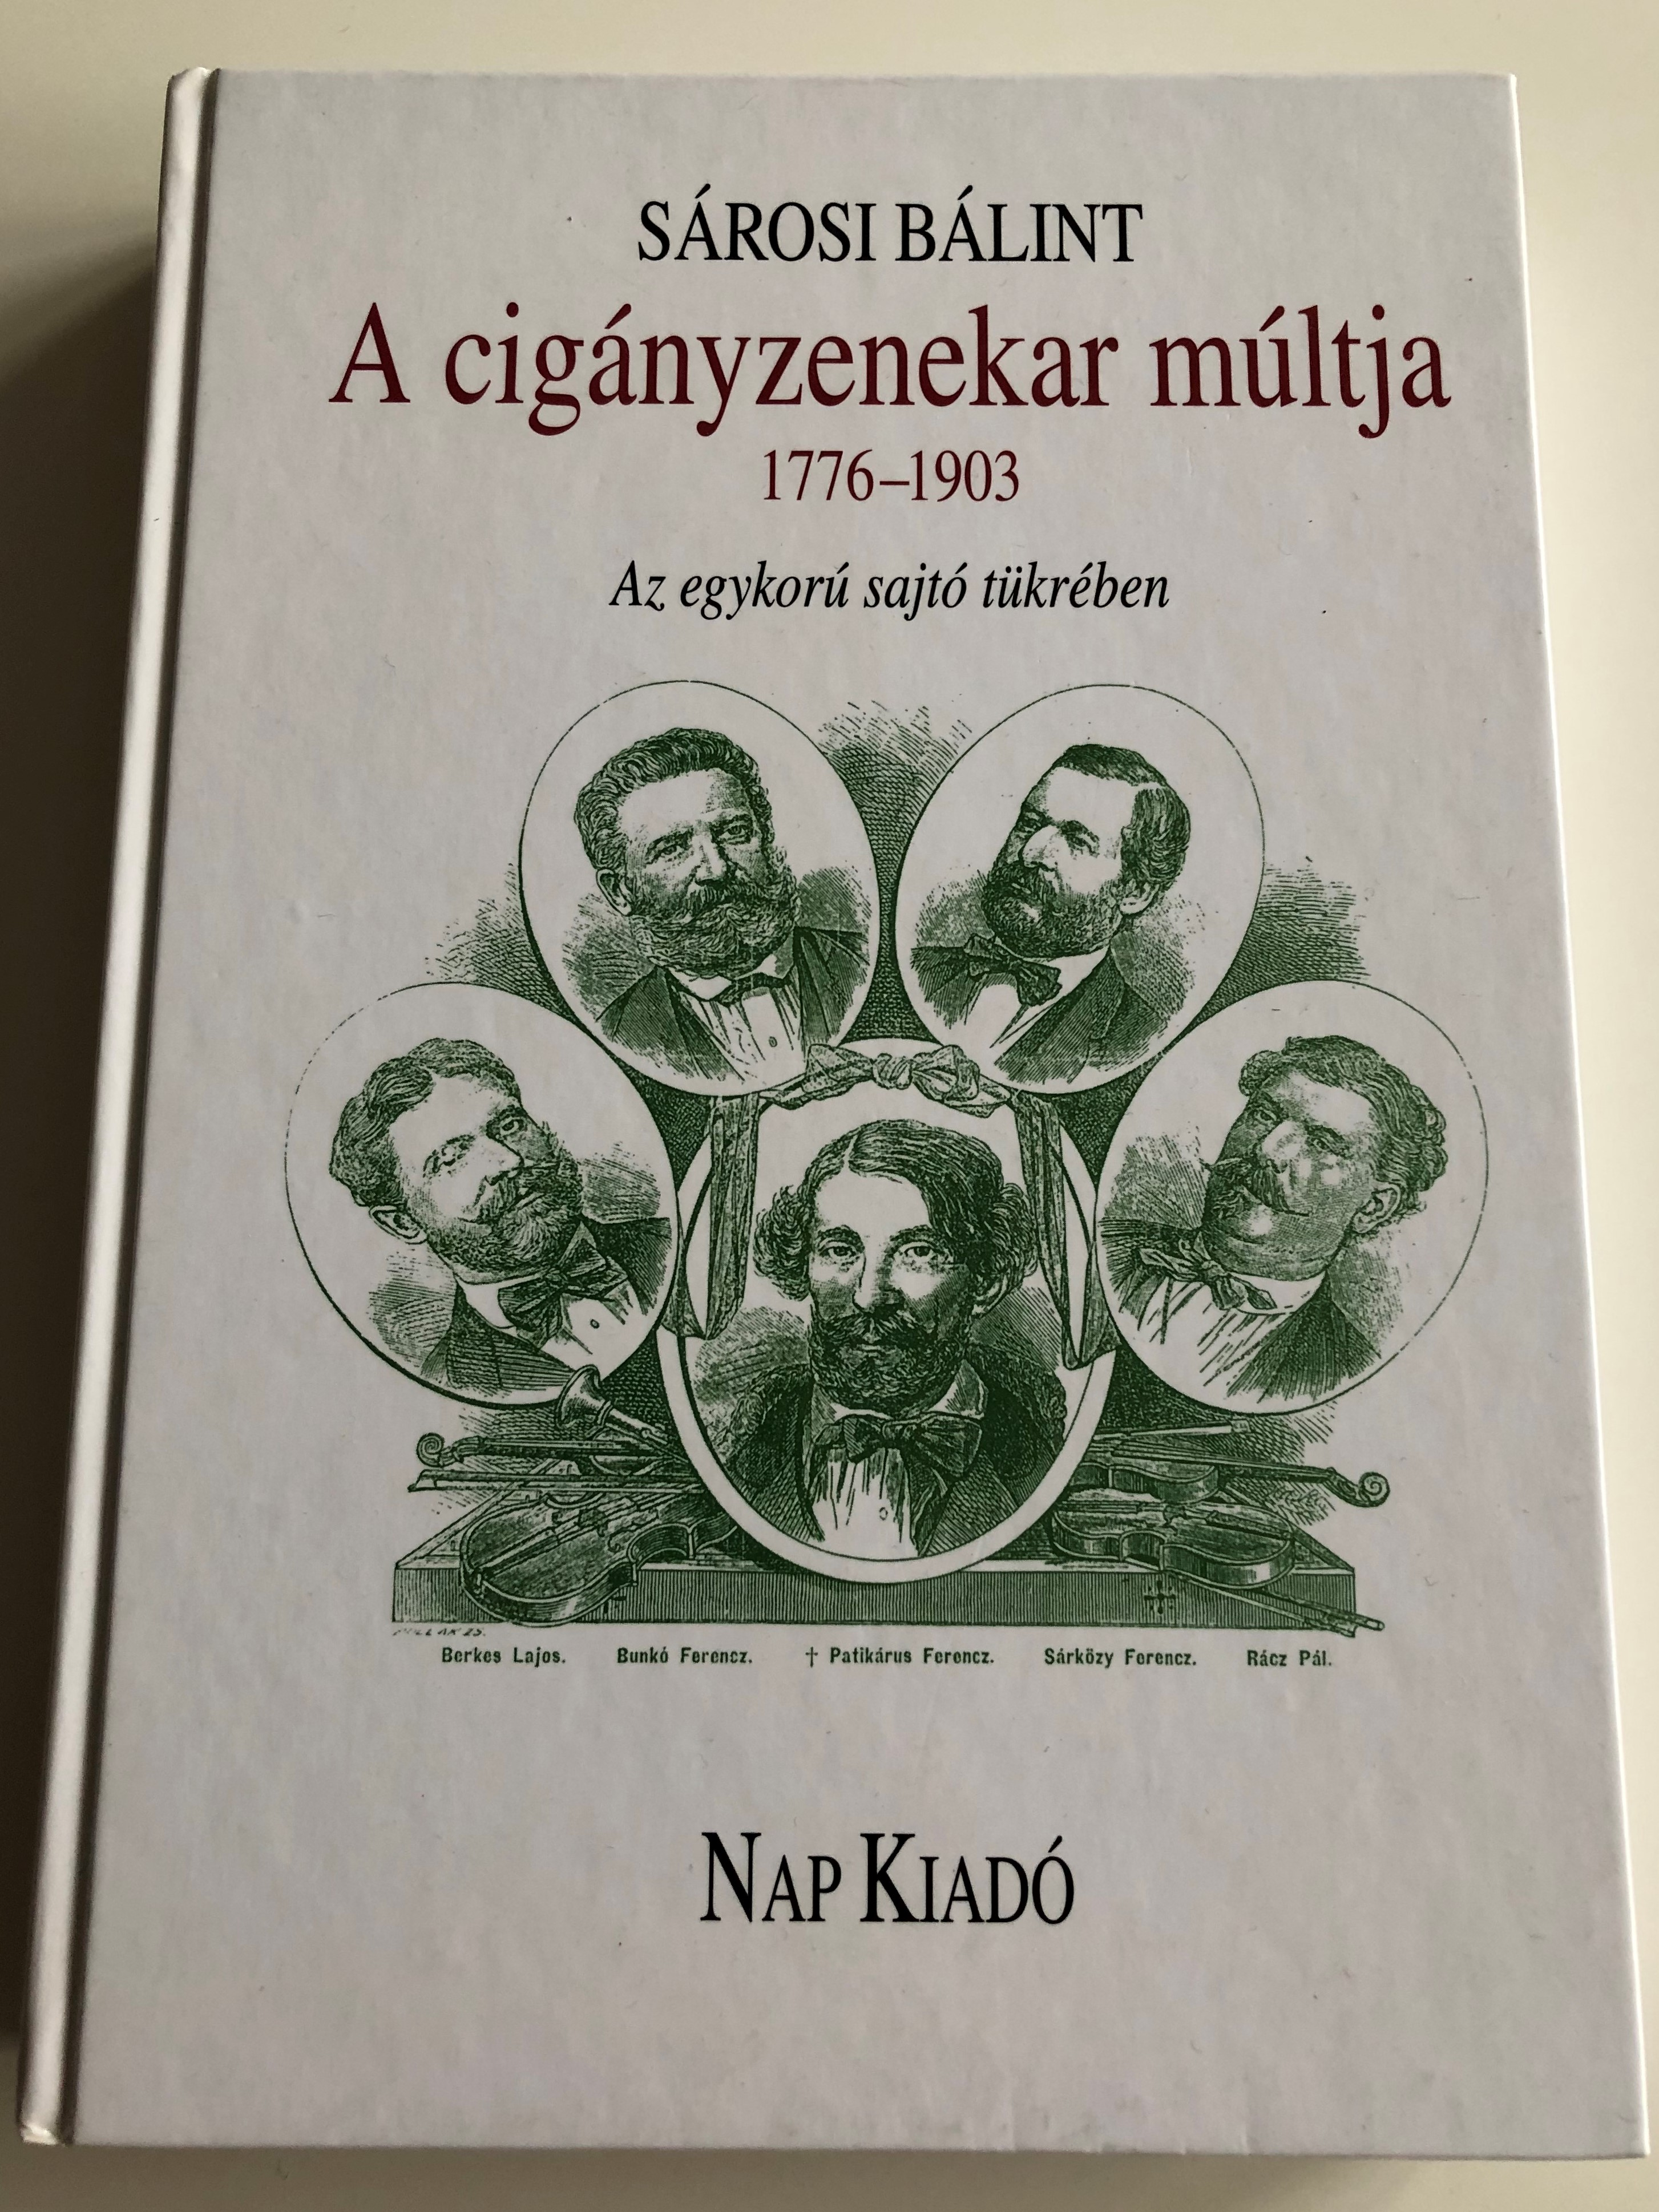 a-cig-nyzenekar-m-ltja-1776-1903-by-s-rosi-b-lint-az-egykor-sajt-t-kr-ben-the-history-of-the-hungarian-gypsy-orchestra-1776-1903-nap-kiad-hardcover-2004-1-.jpg